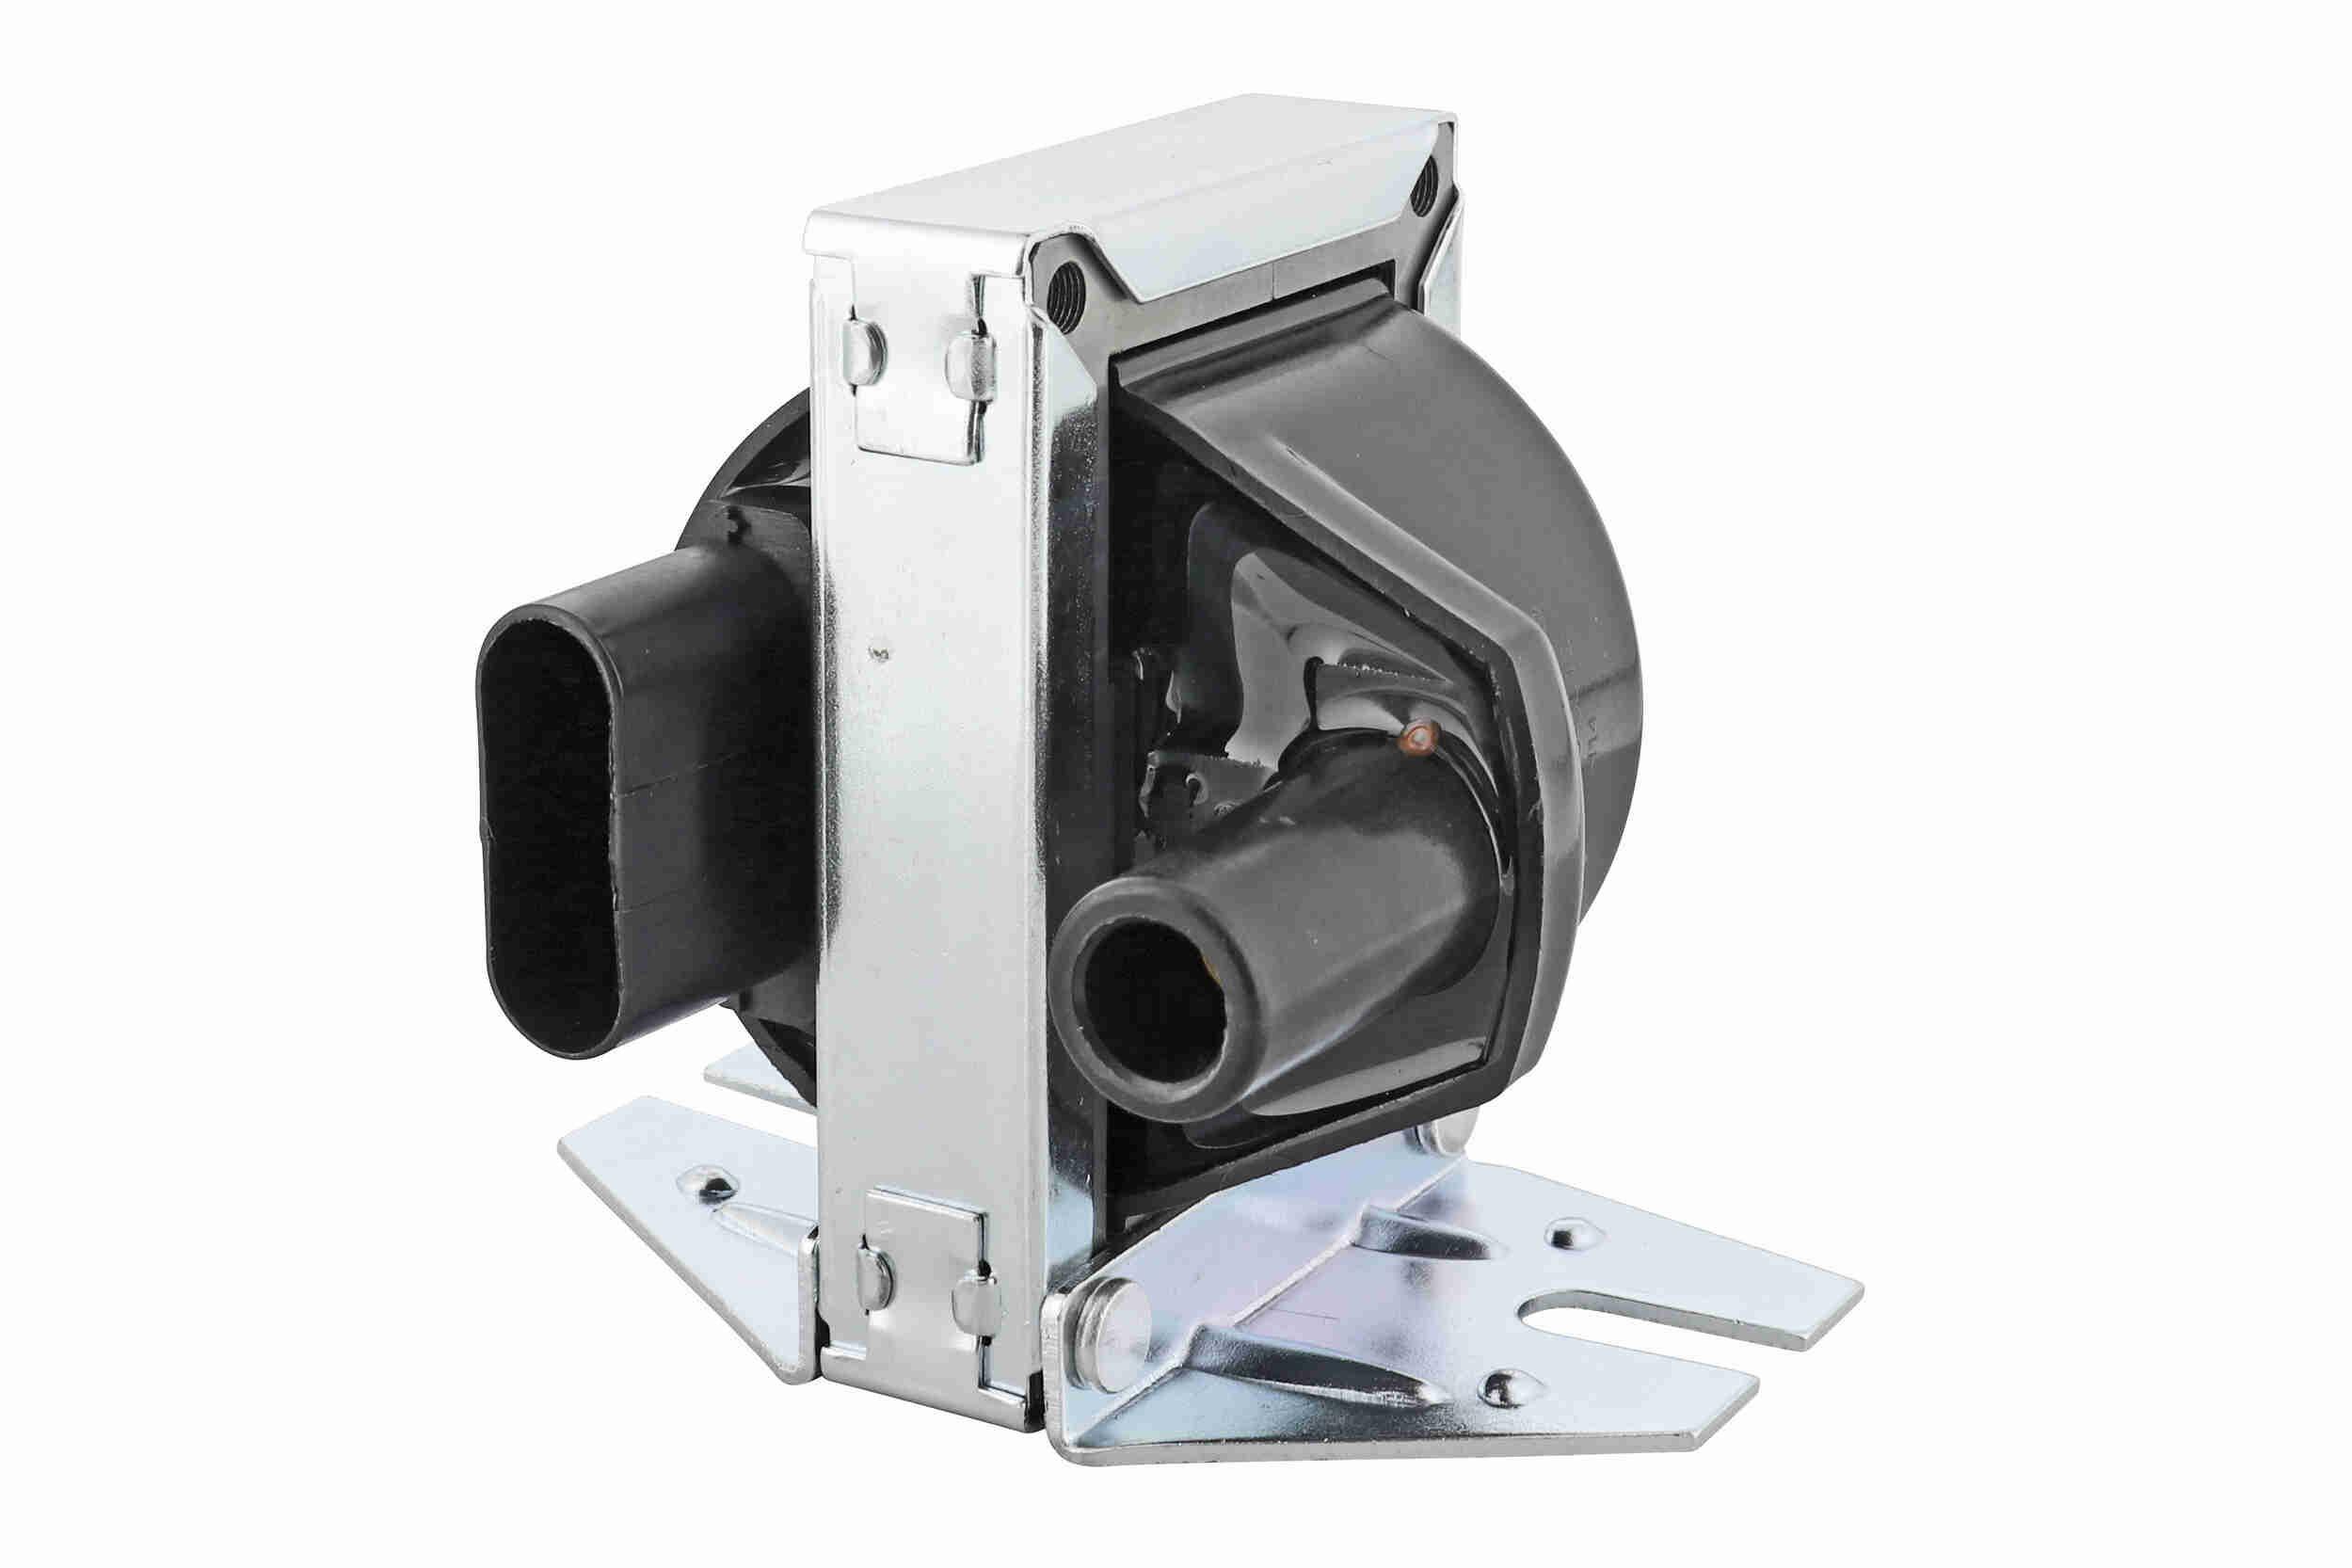 Einzelzündspule VEMO V24-70-0012 Erfahrung